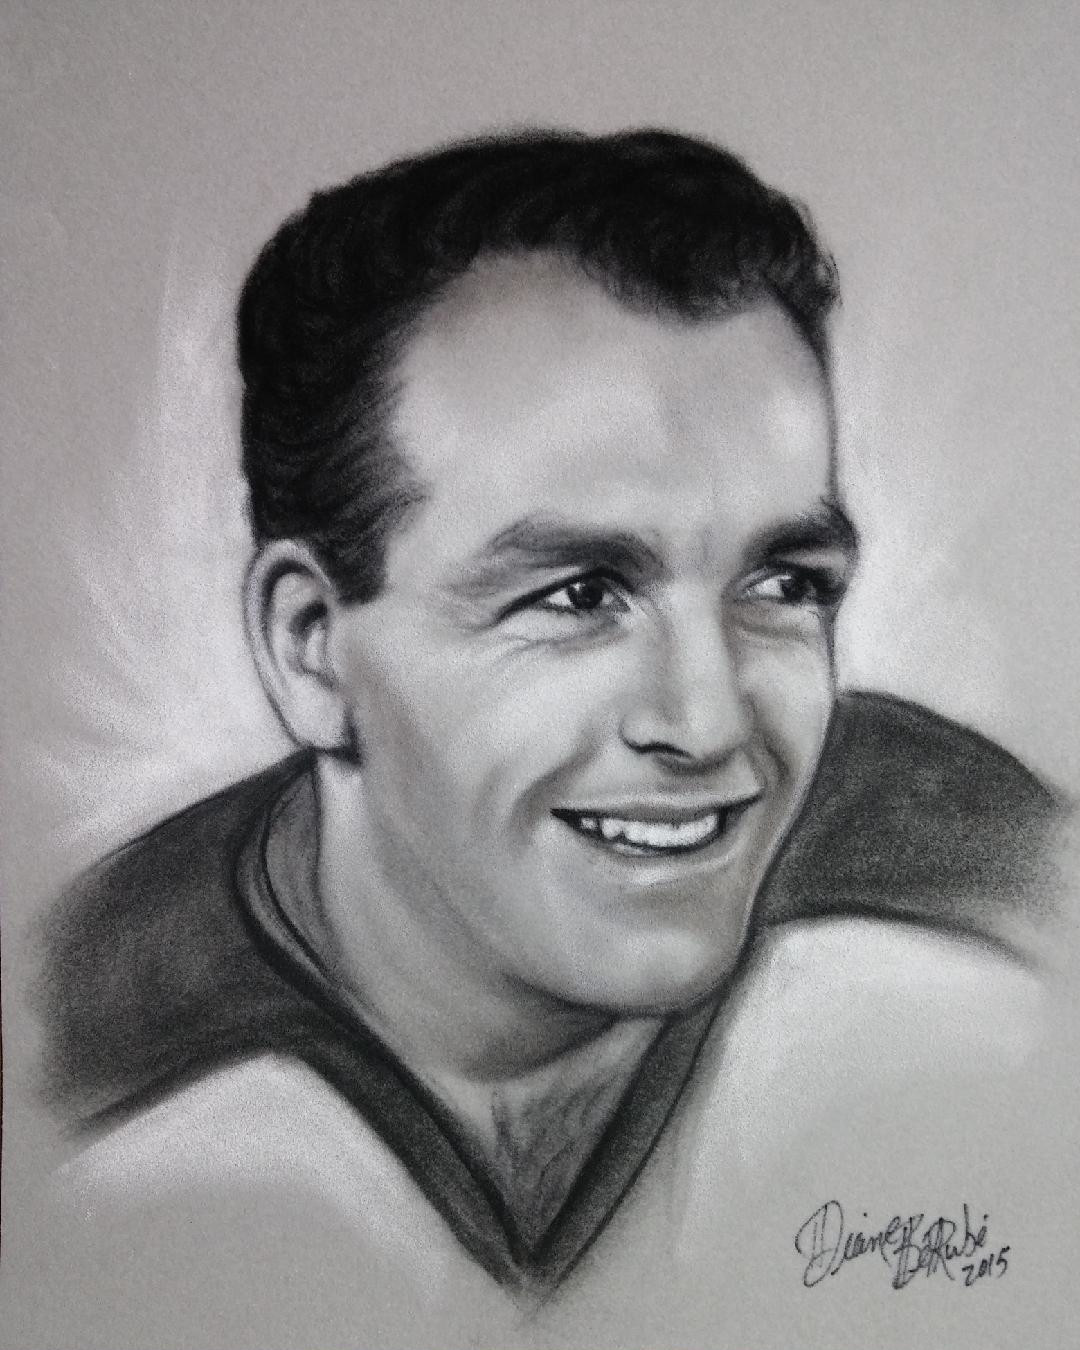 Henri Richard fusain